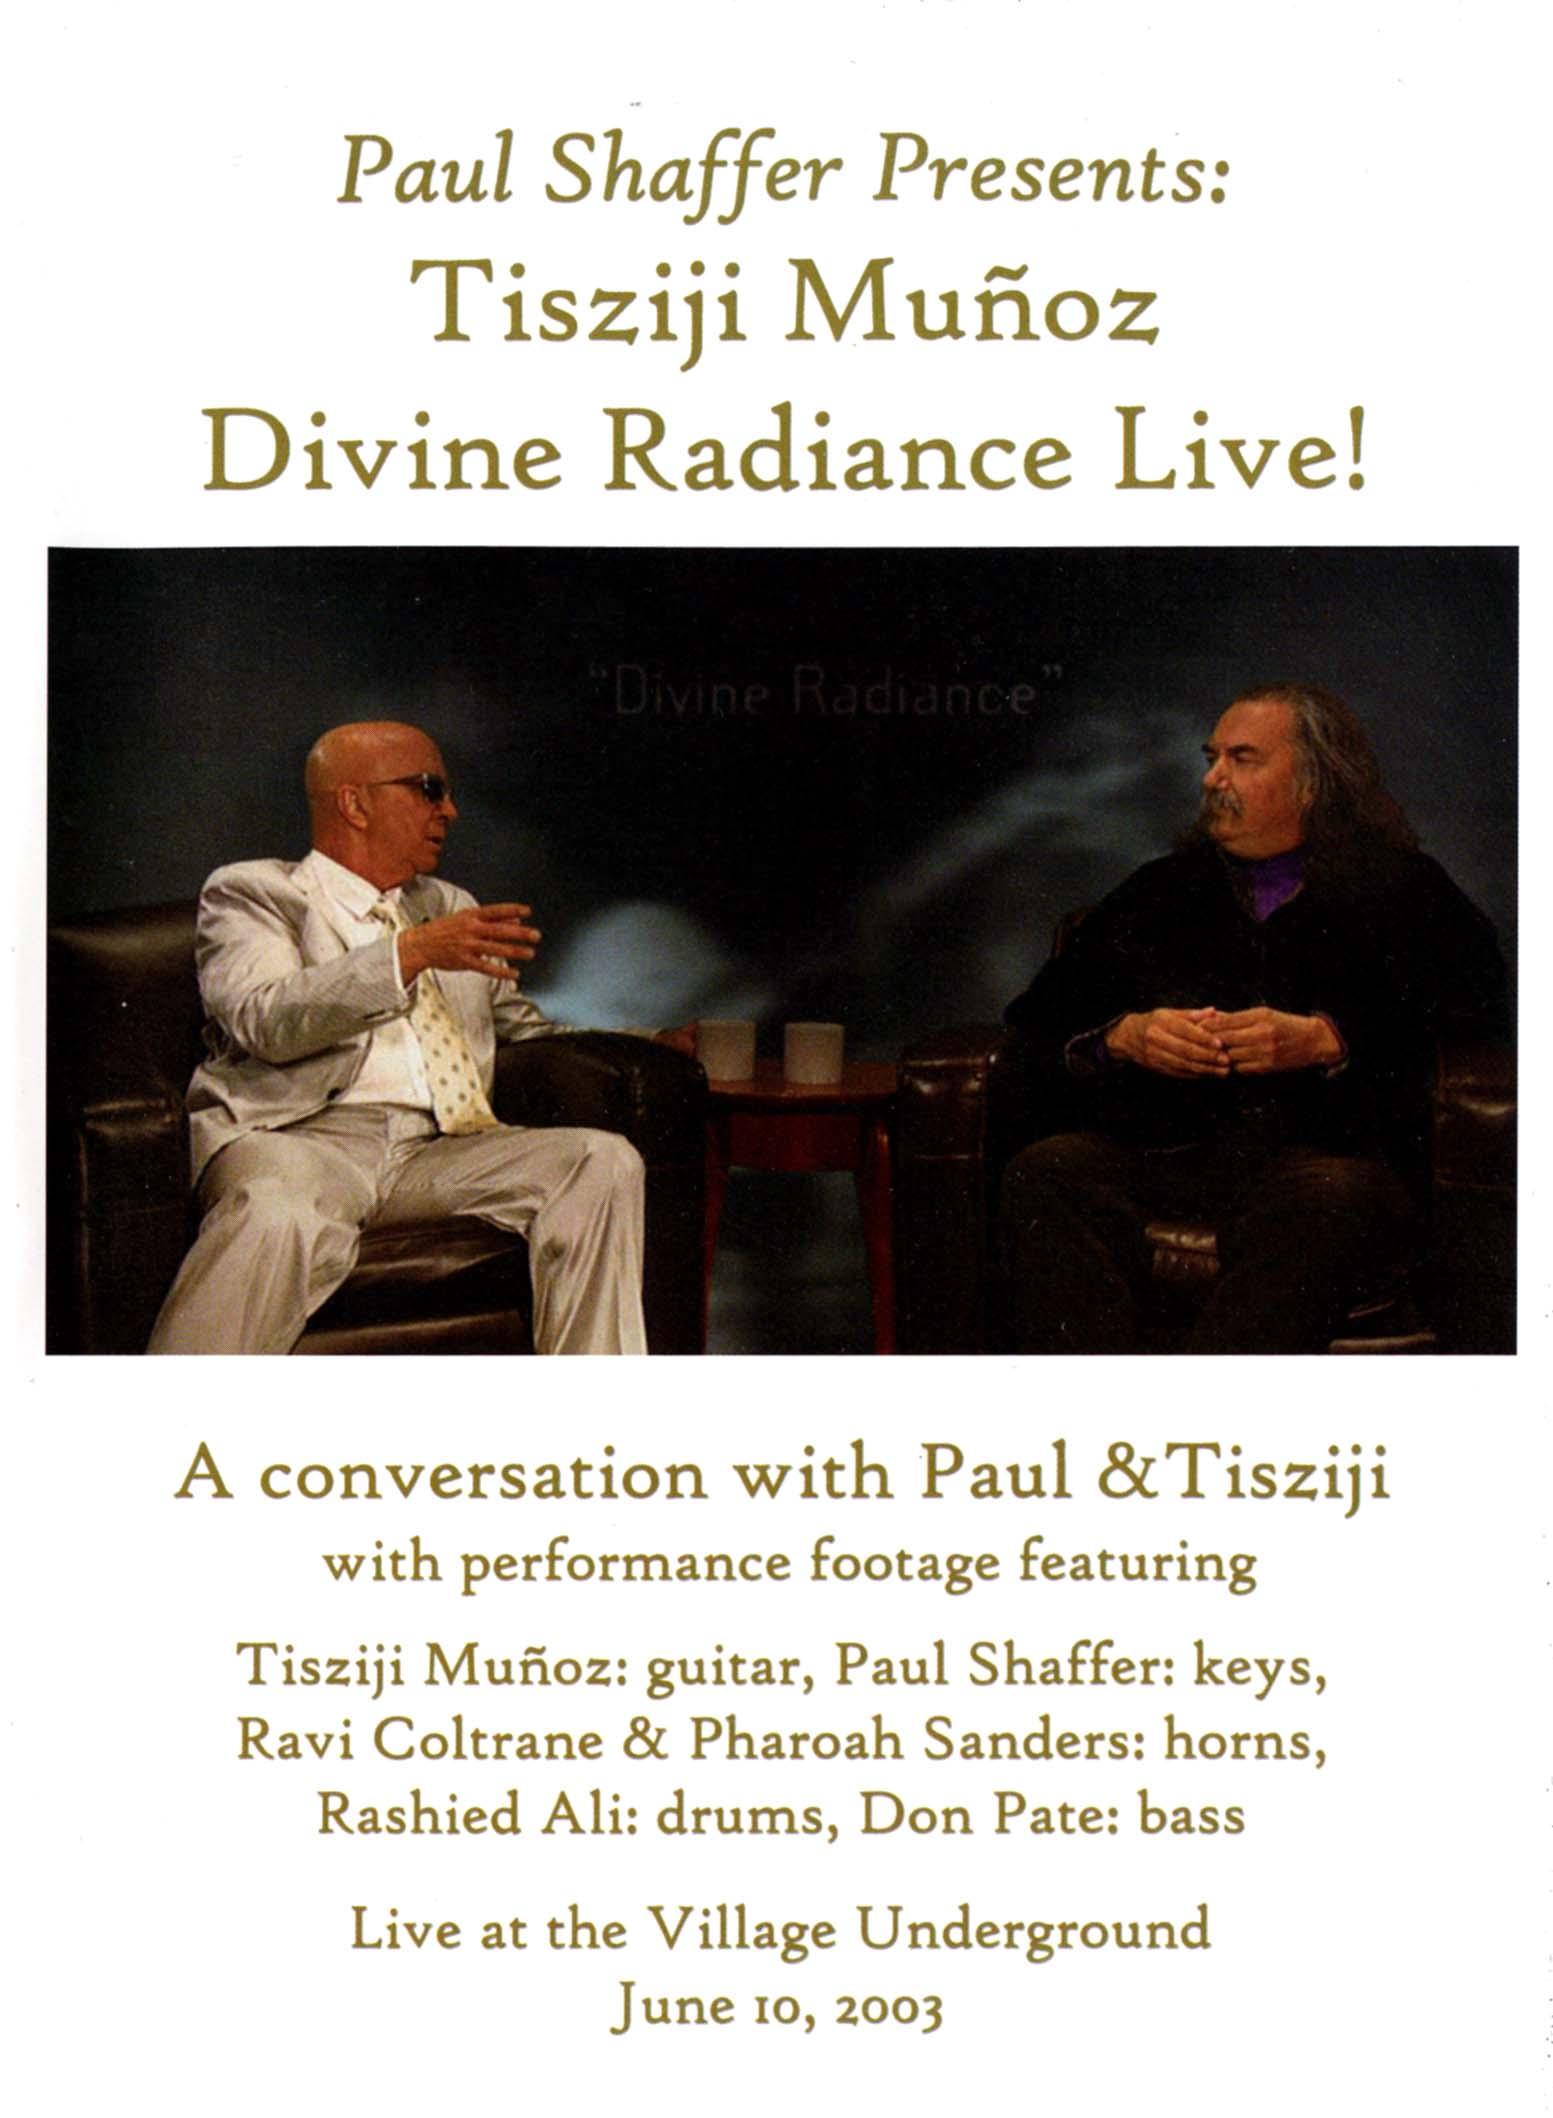 Paul Shaffer Presents: Tisziji Muñoz - Divine Radiance Live!